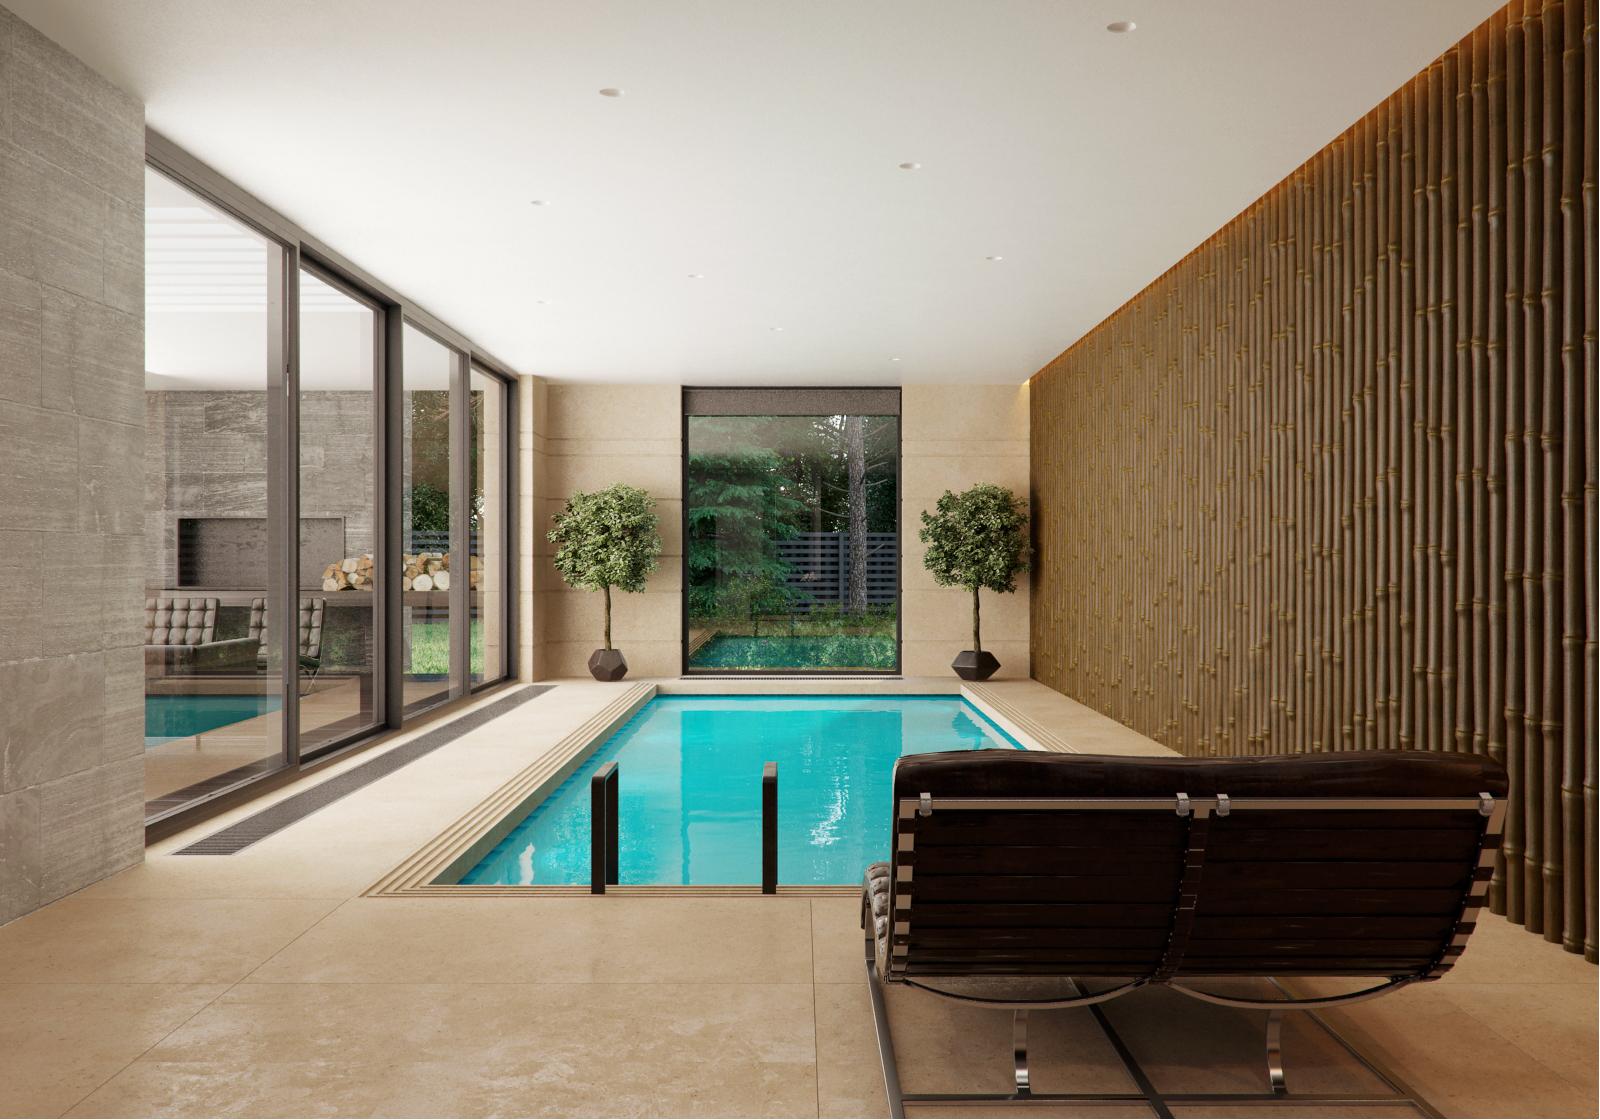 Modern House Interior Design Ideas With Elegant Indoor